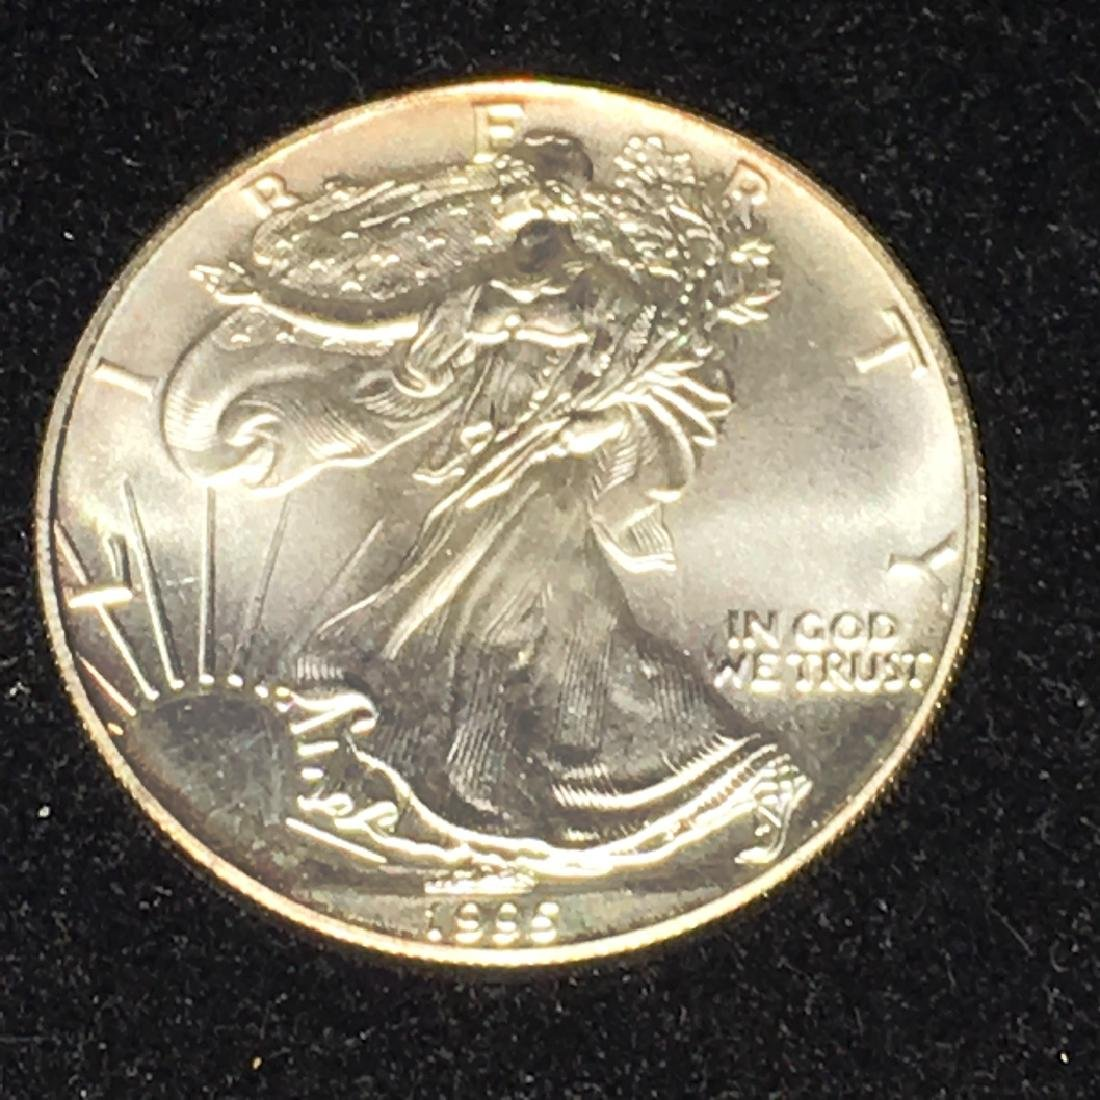 1995 SILVER EAGLE $1